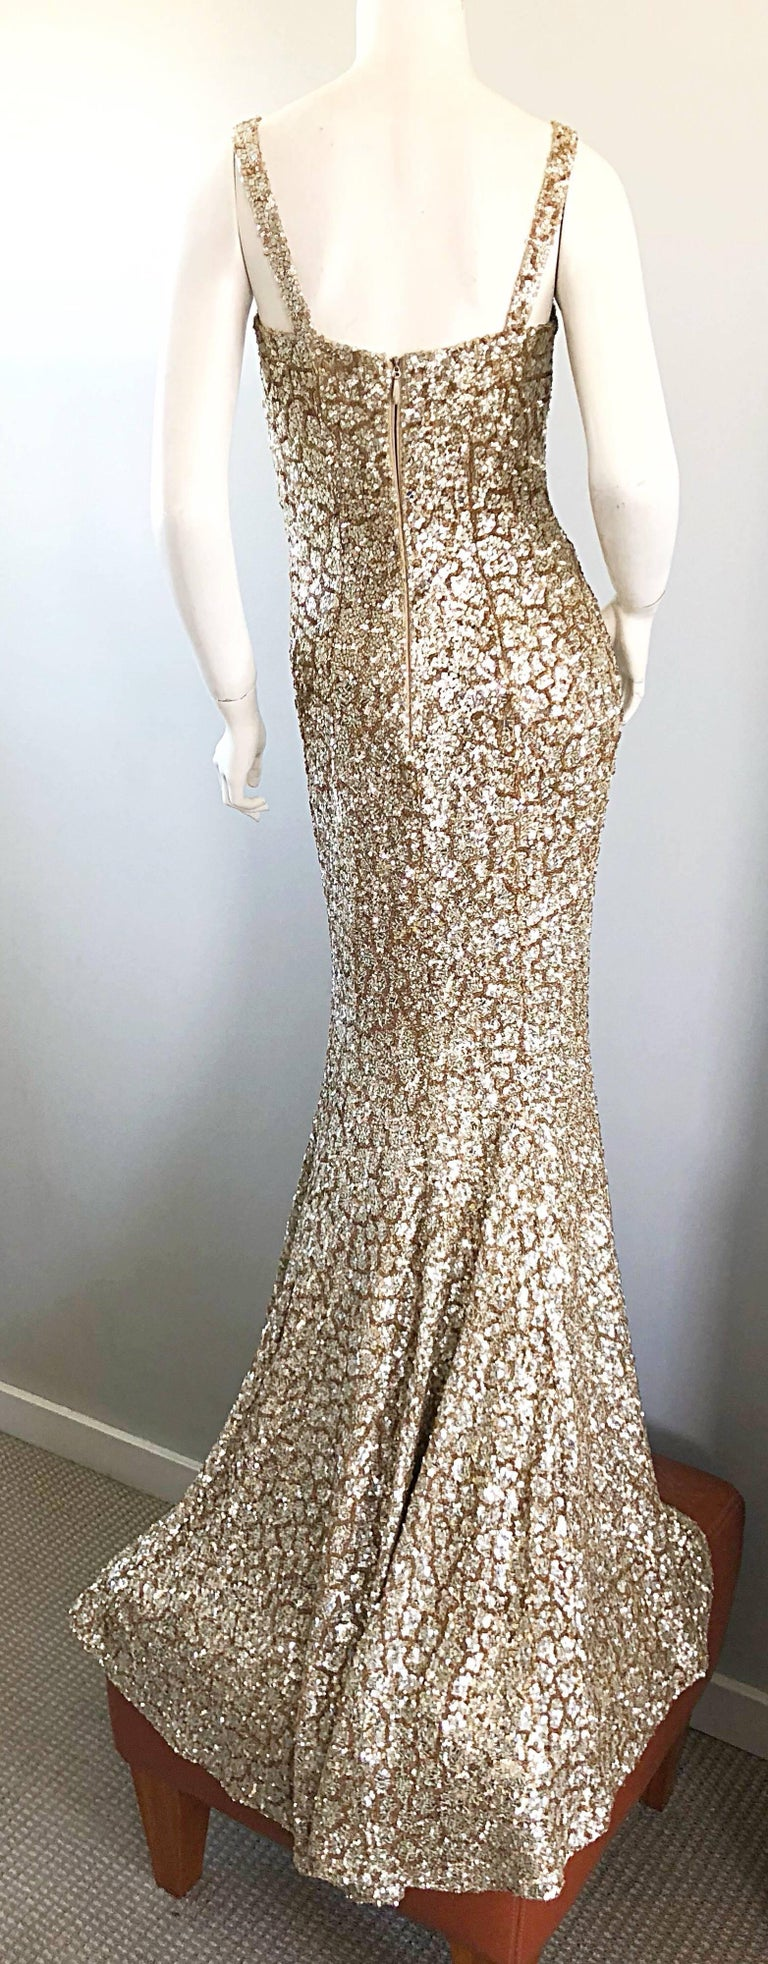 Monique Lhuillier Gorgeous Resort 2012 Gold Rose Gold Full Sequin ...